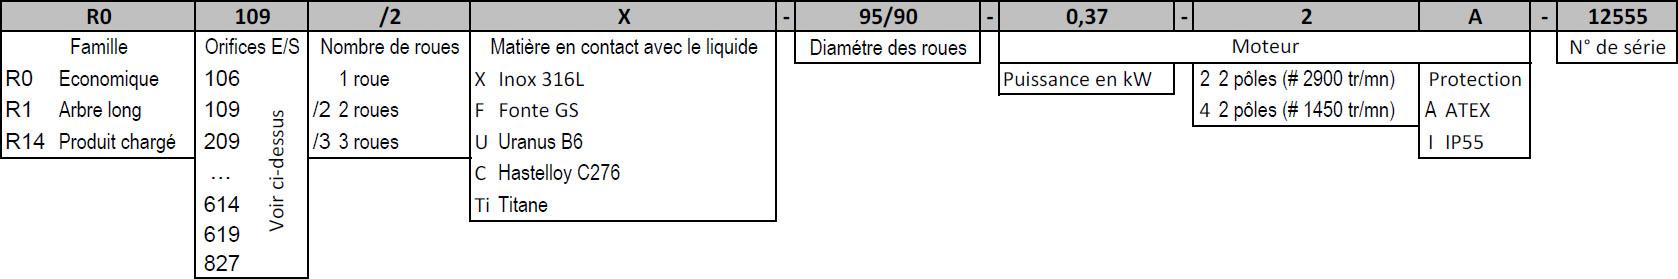 R0-16-FR-9